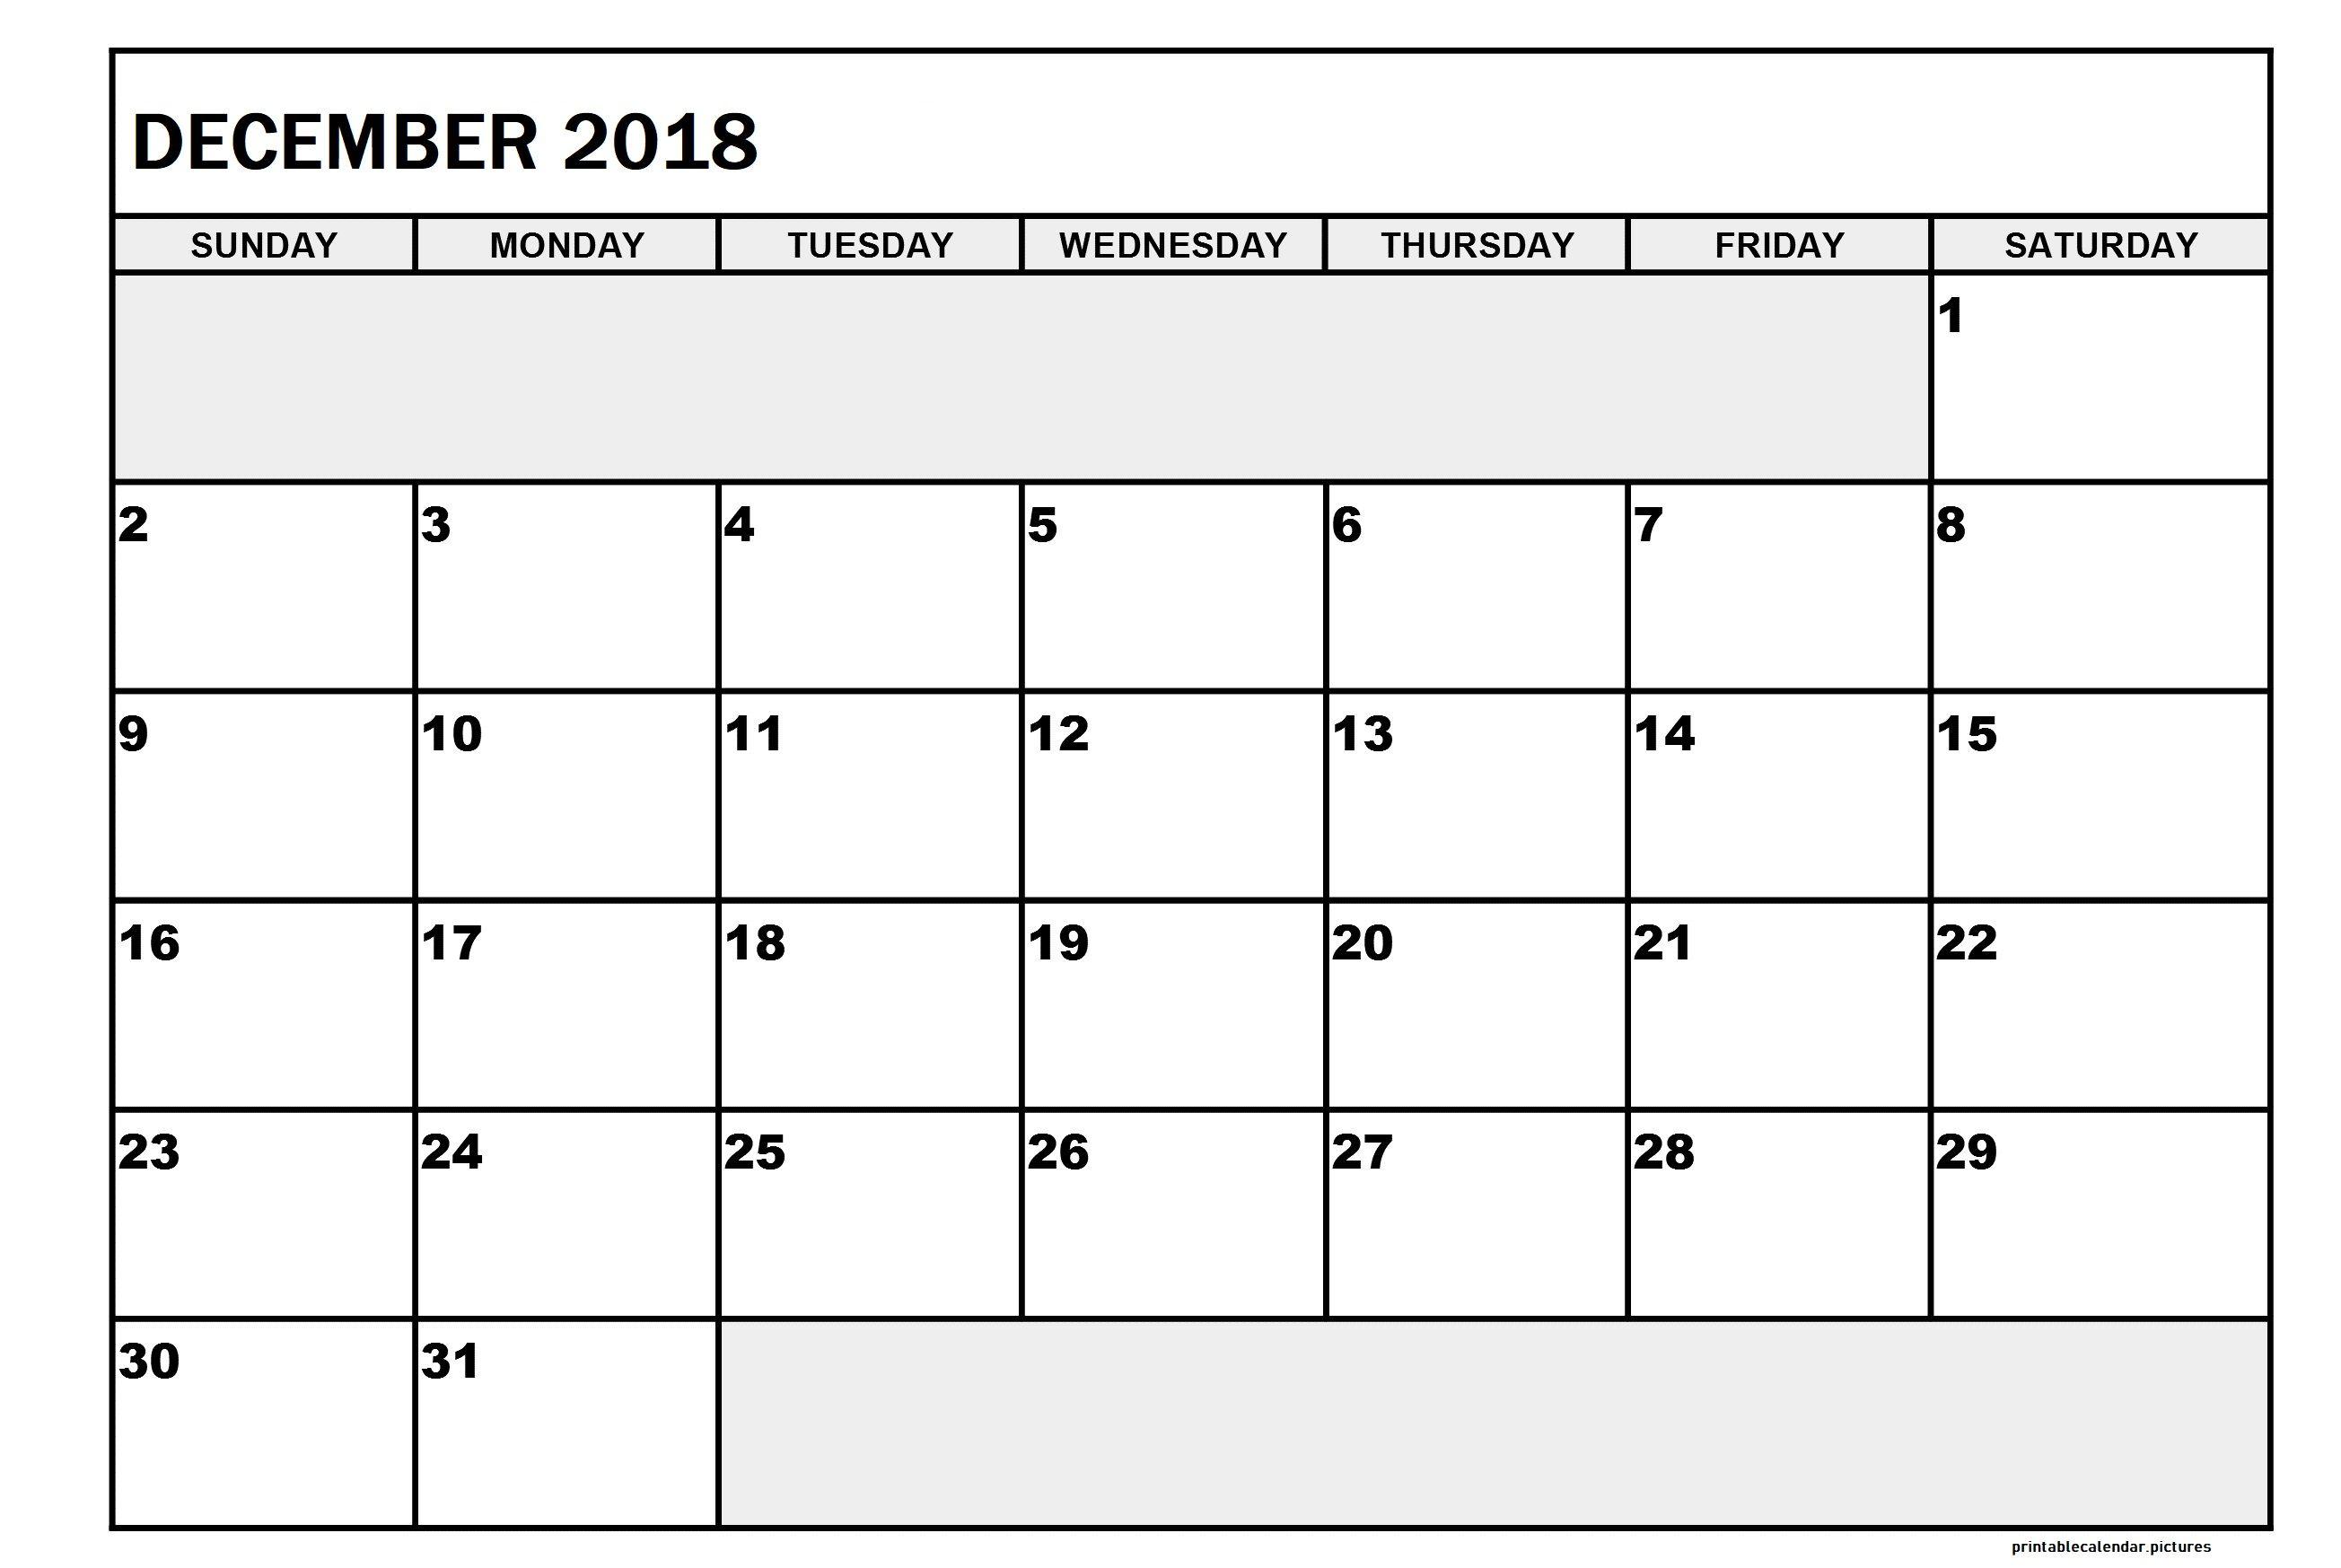 December 2018 Printable Calendar December 2018 Printable